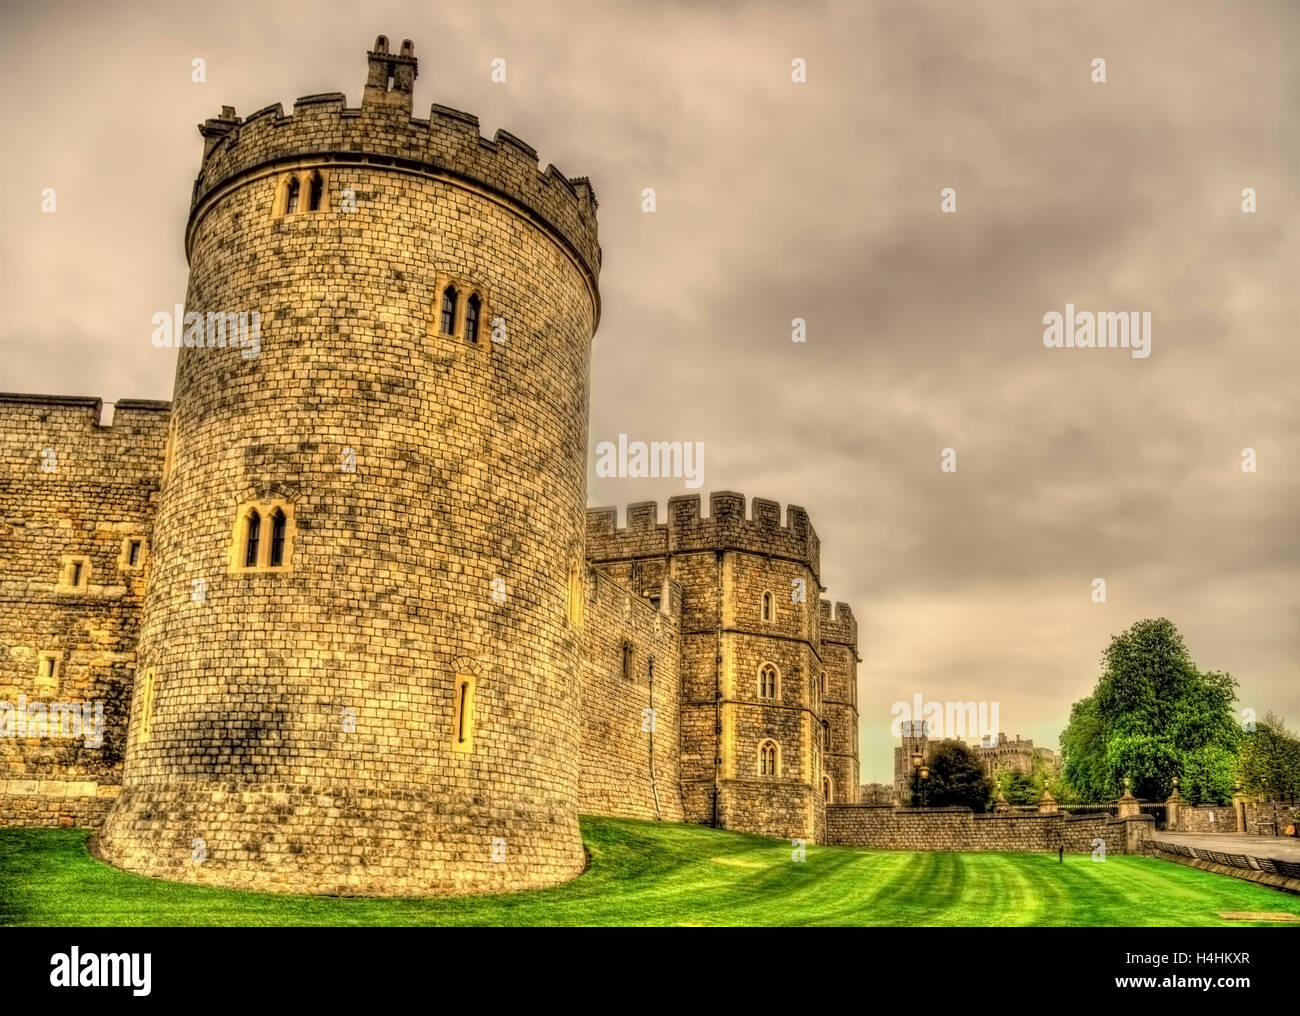 Türme von Windsor Castle in der Nähe von London, England Stockbild